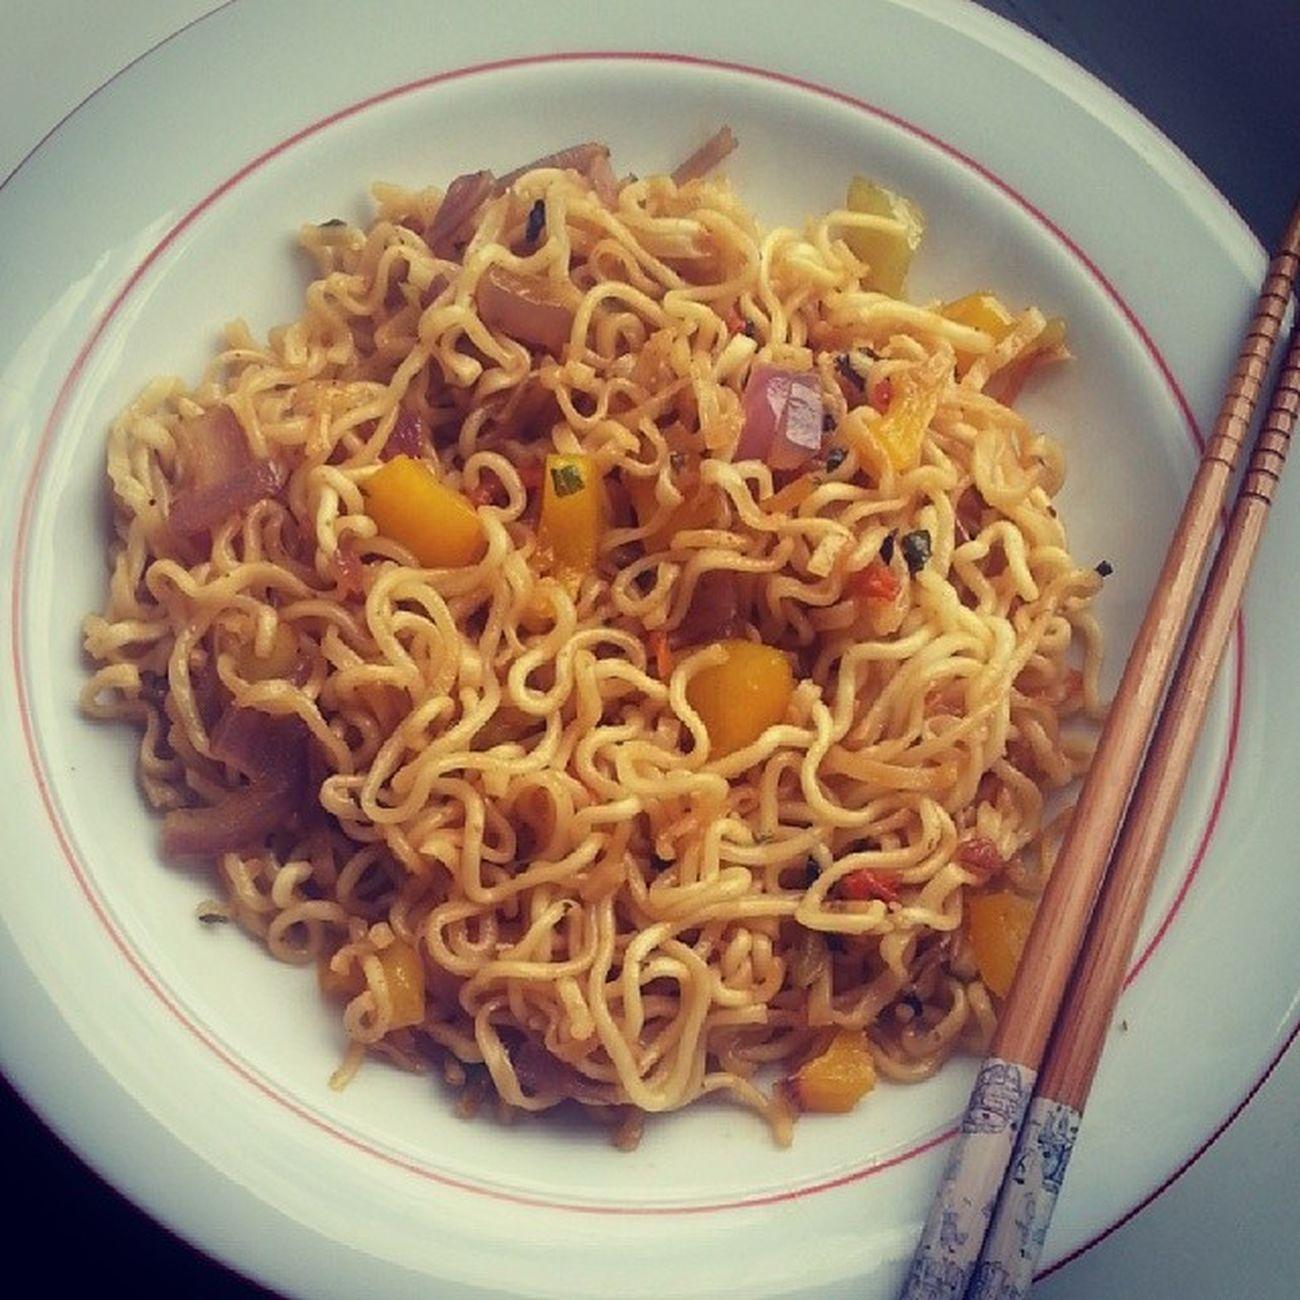 Noodletime🍝 Khaja Khane Bela chopstick seasoning? nepalifood asianfood ✌instafood yummy igers ?igersnepal hmm ?